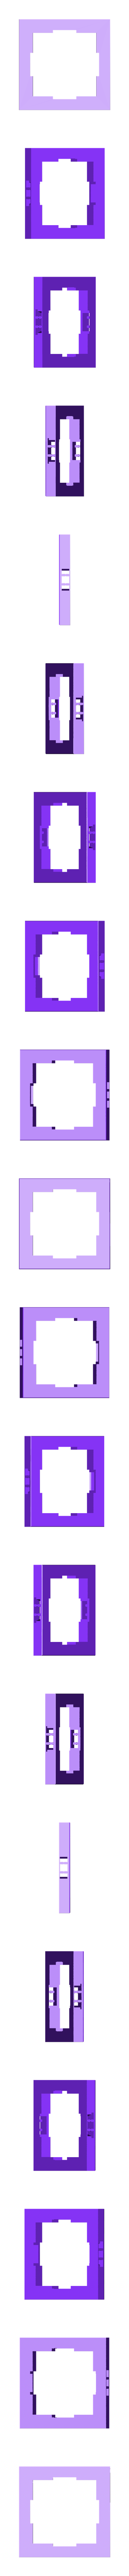 2x2_Platform.stl Download free STL file OpenFoliage Cliff Set - Support Free Printing - Modular • 3D print design, BellForged